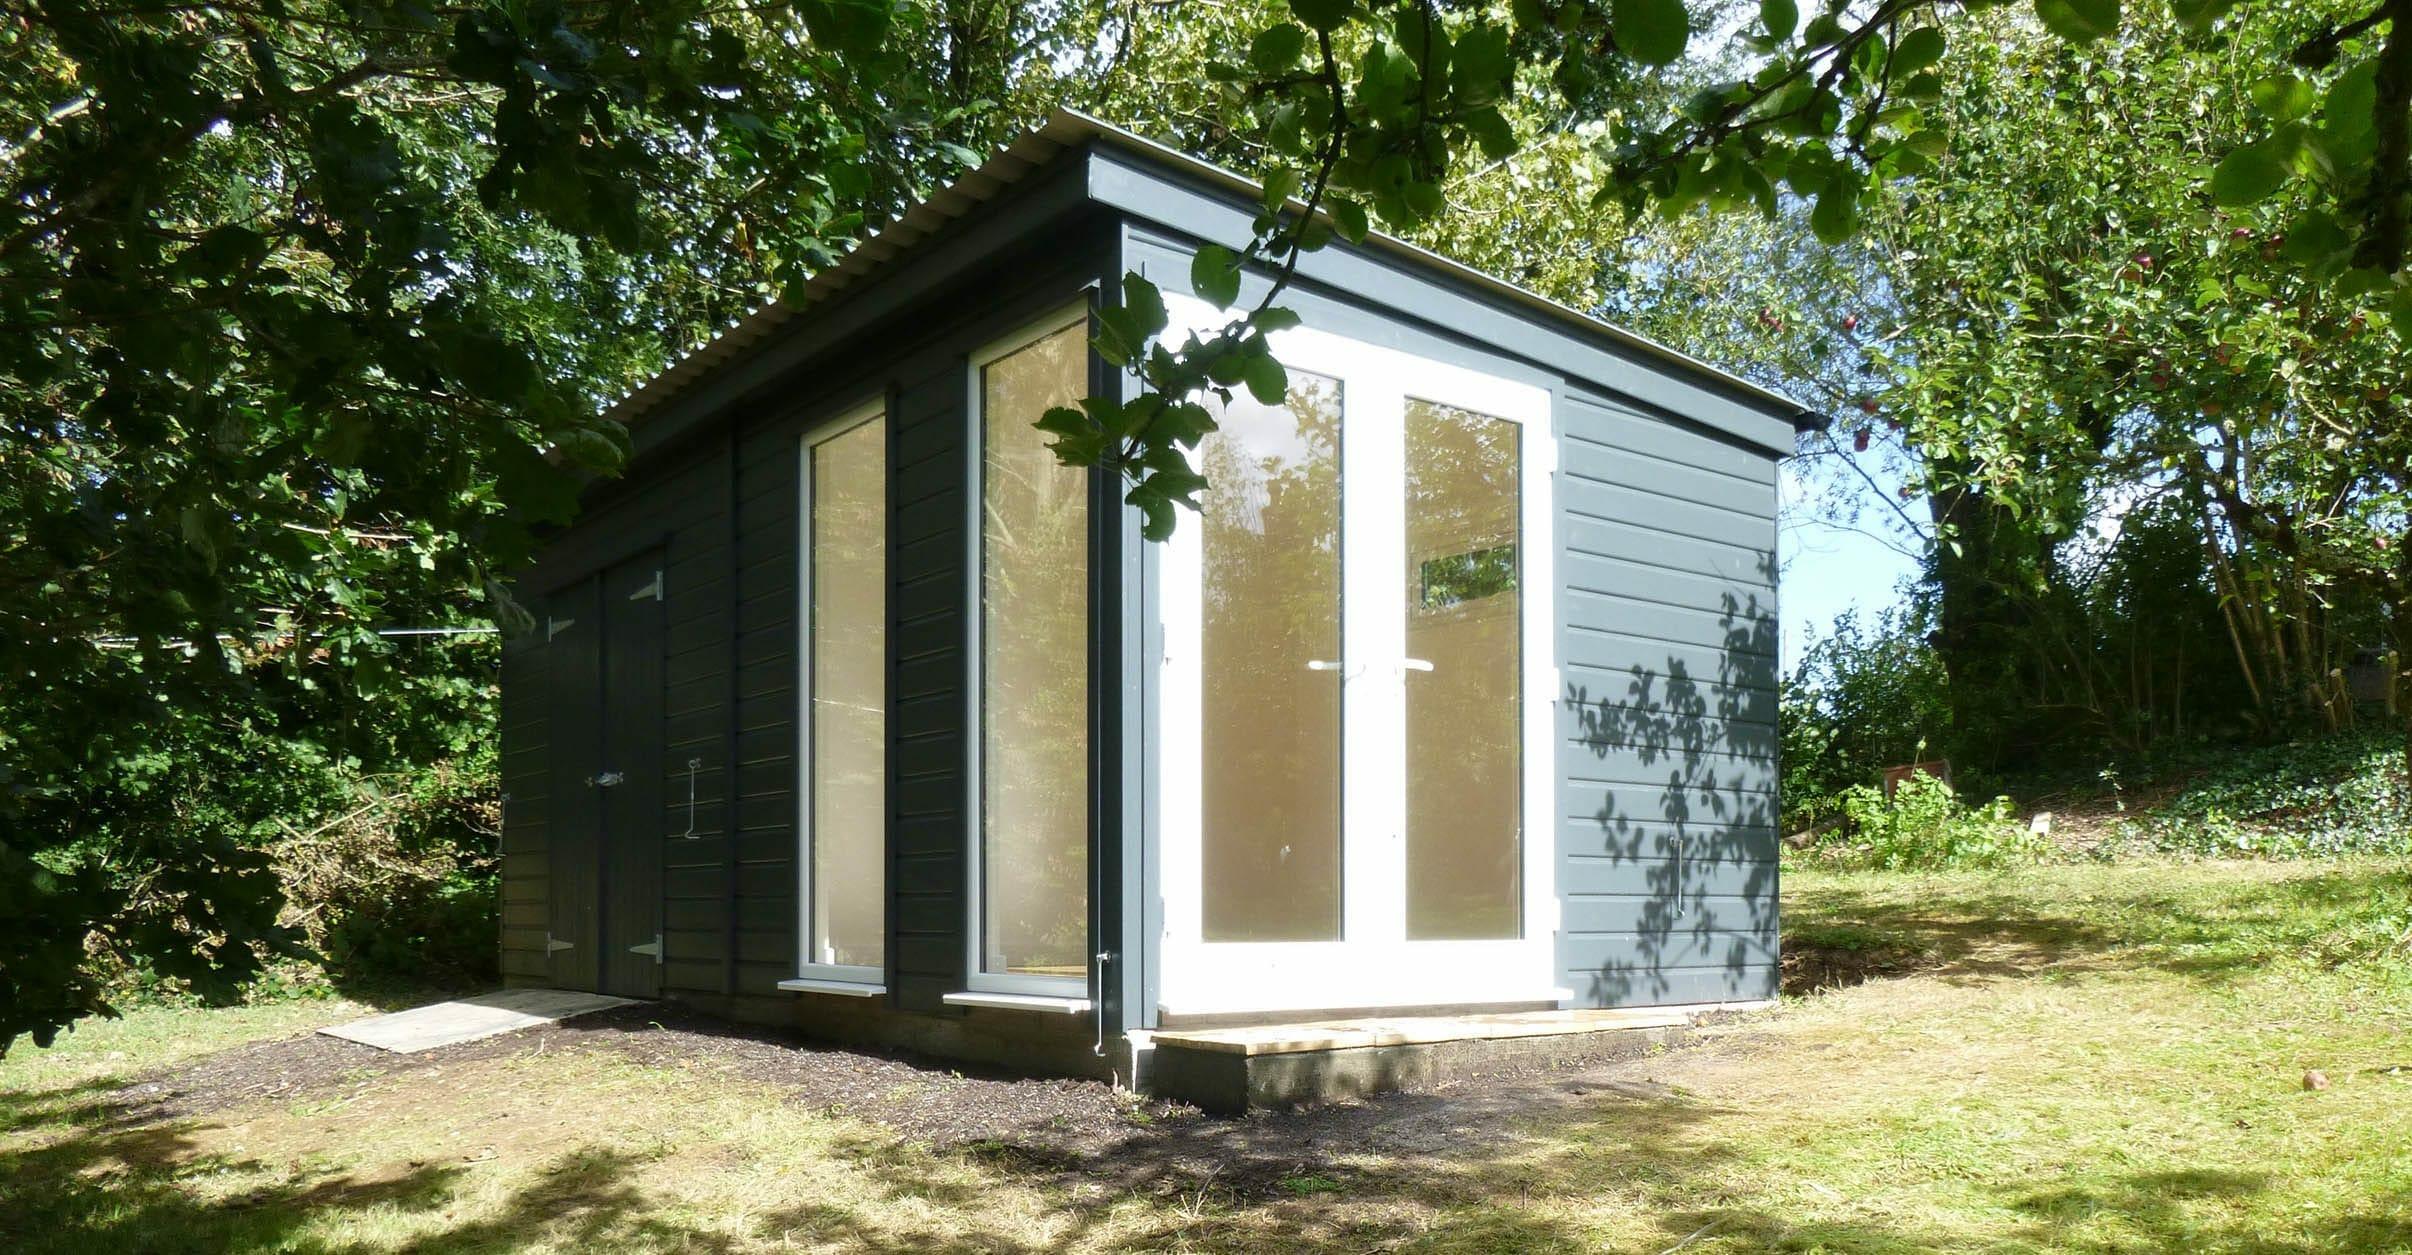 Combination garden studio shed